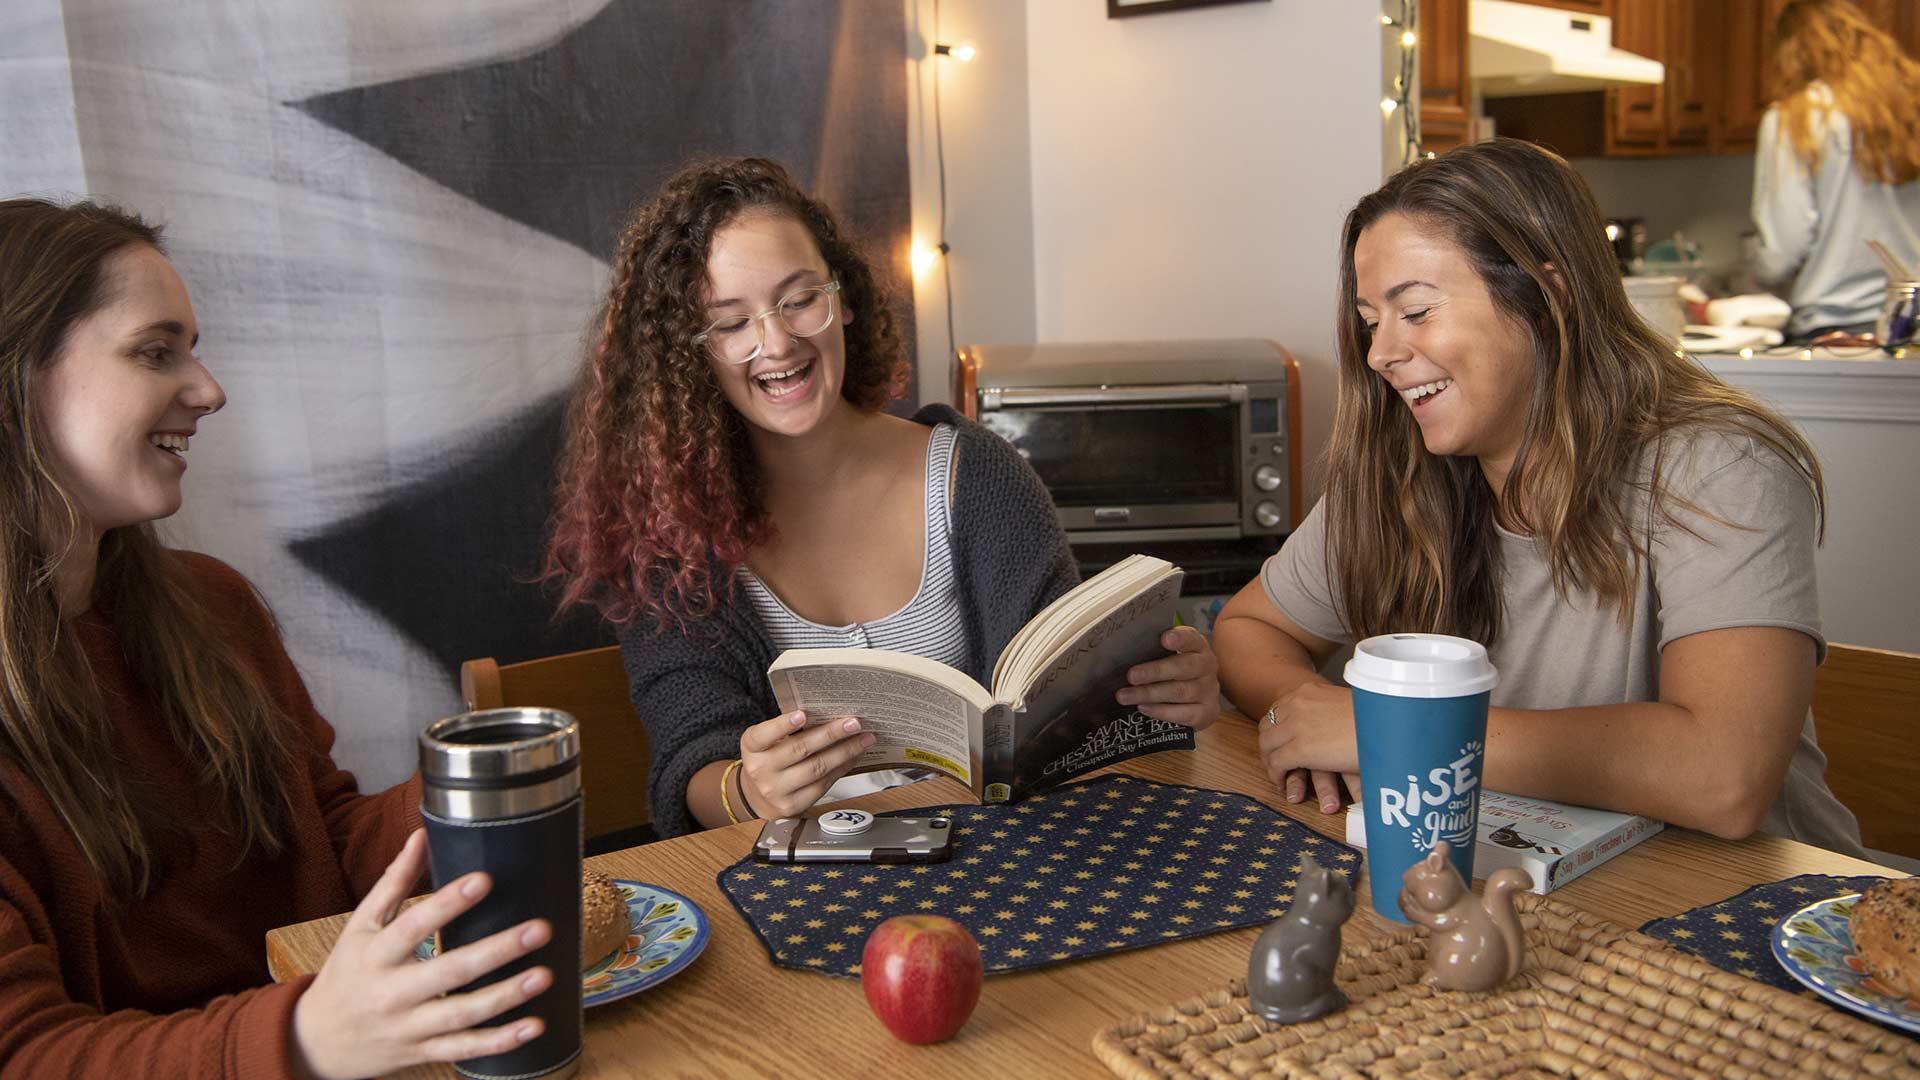 smcm-deposit-photo-illustration-students-in-dorms-2-bagels-n-books